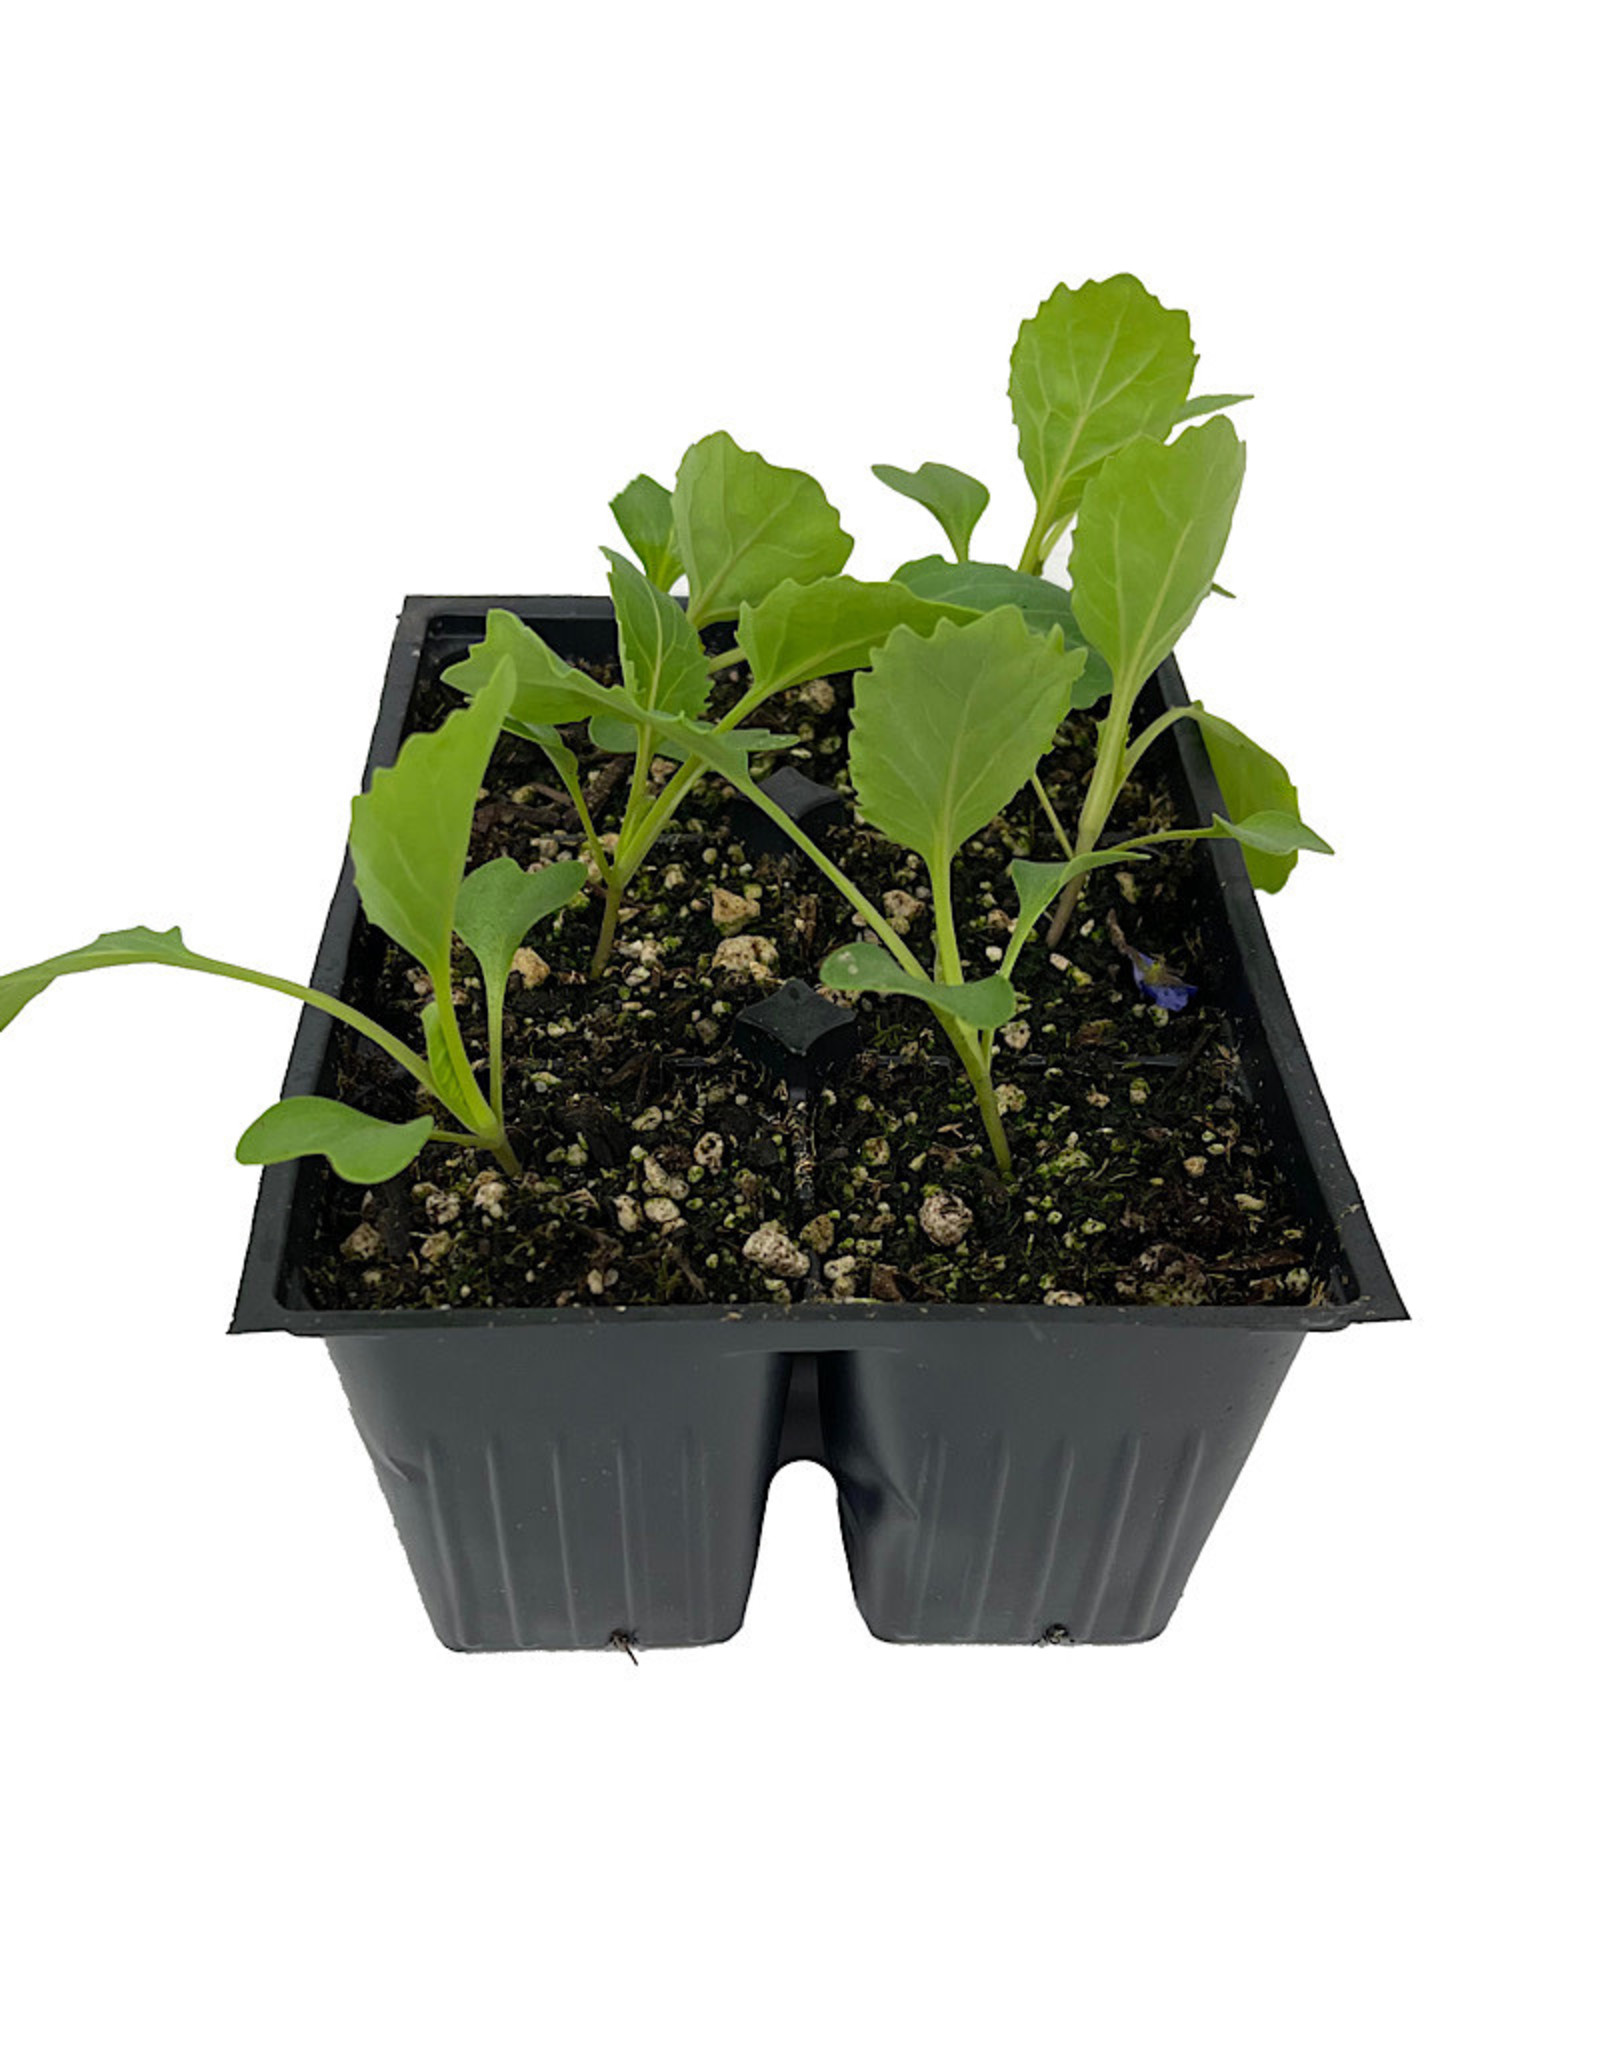 Cabbage 'Golden Acre' Jumbo Traypack